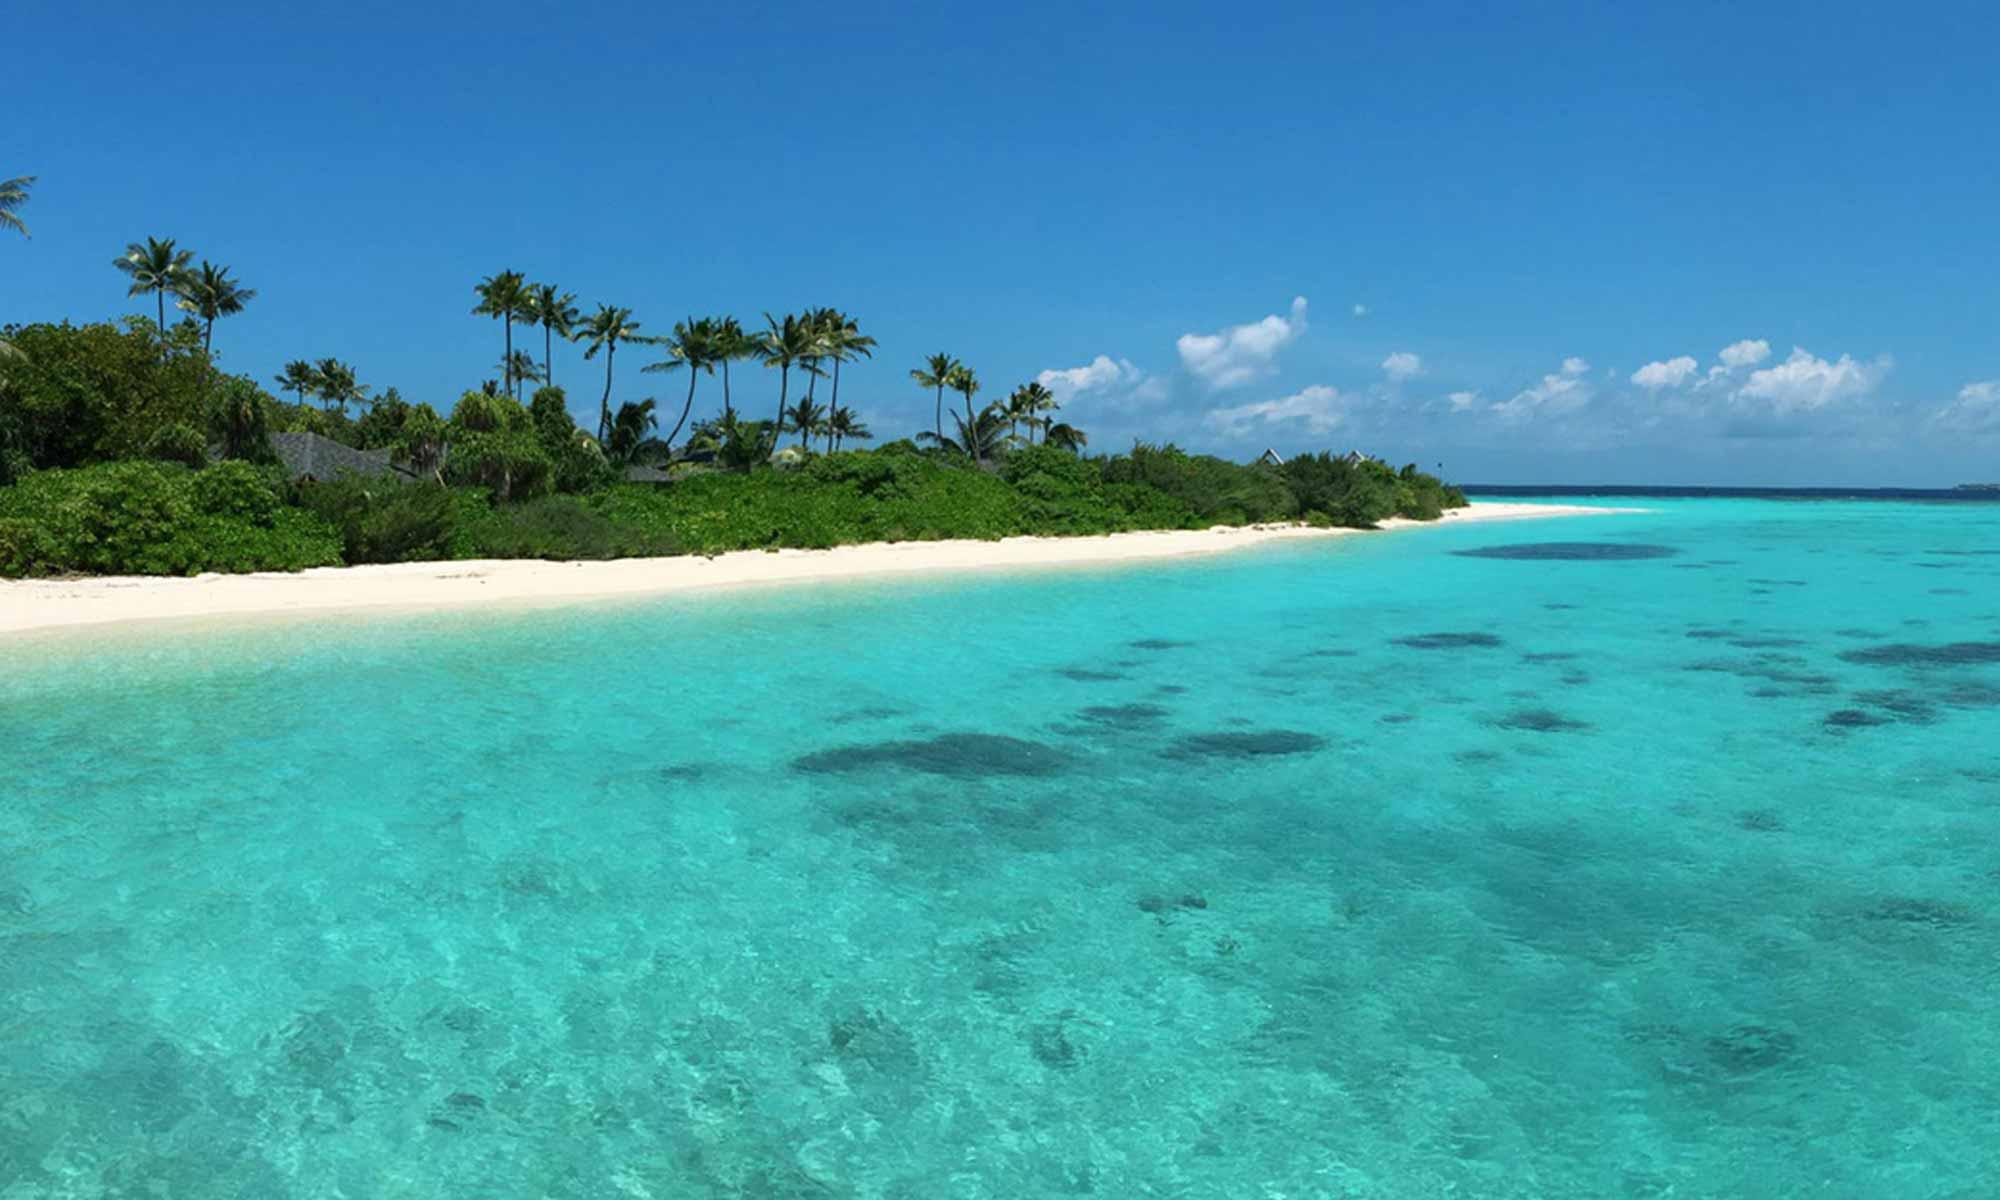 Slow Dive Indischer Ozean Malediven Euro Divers Amari Havodda Strand